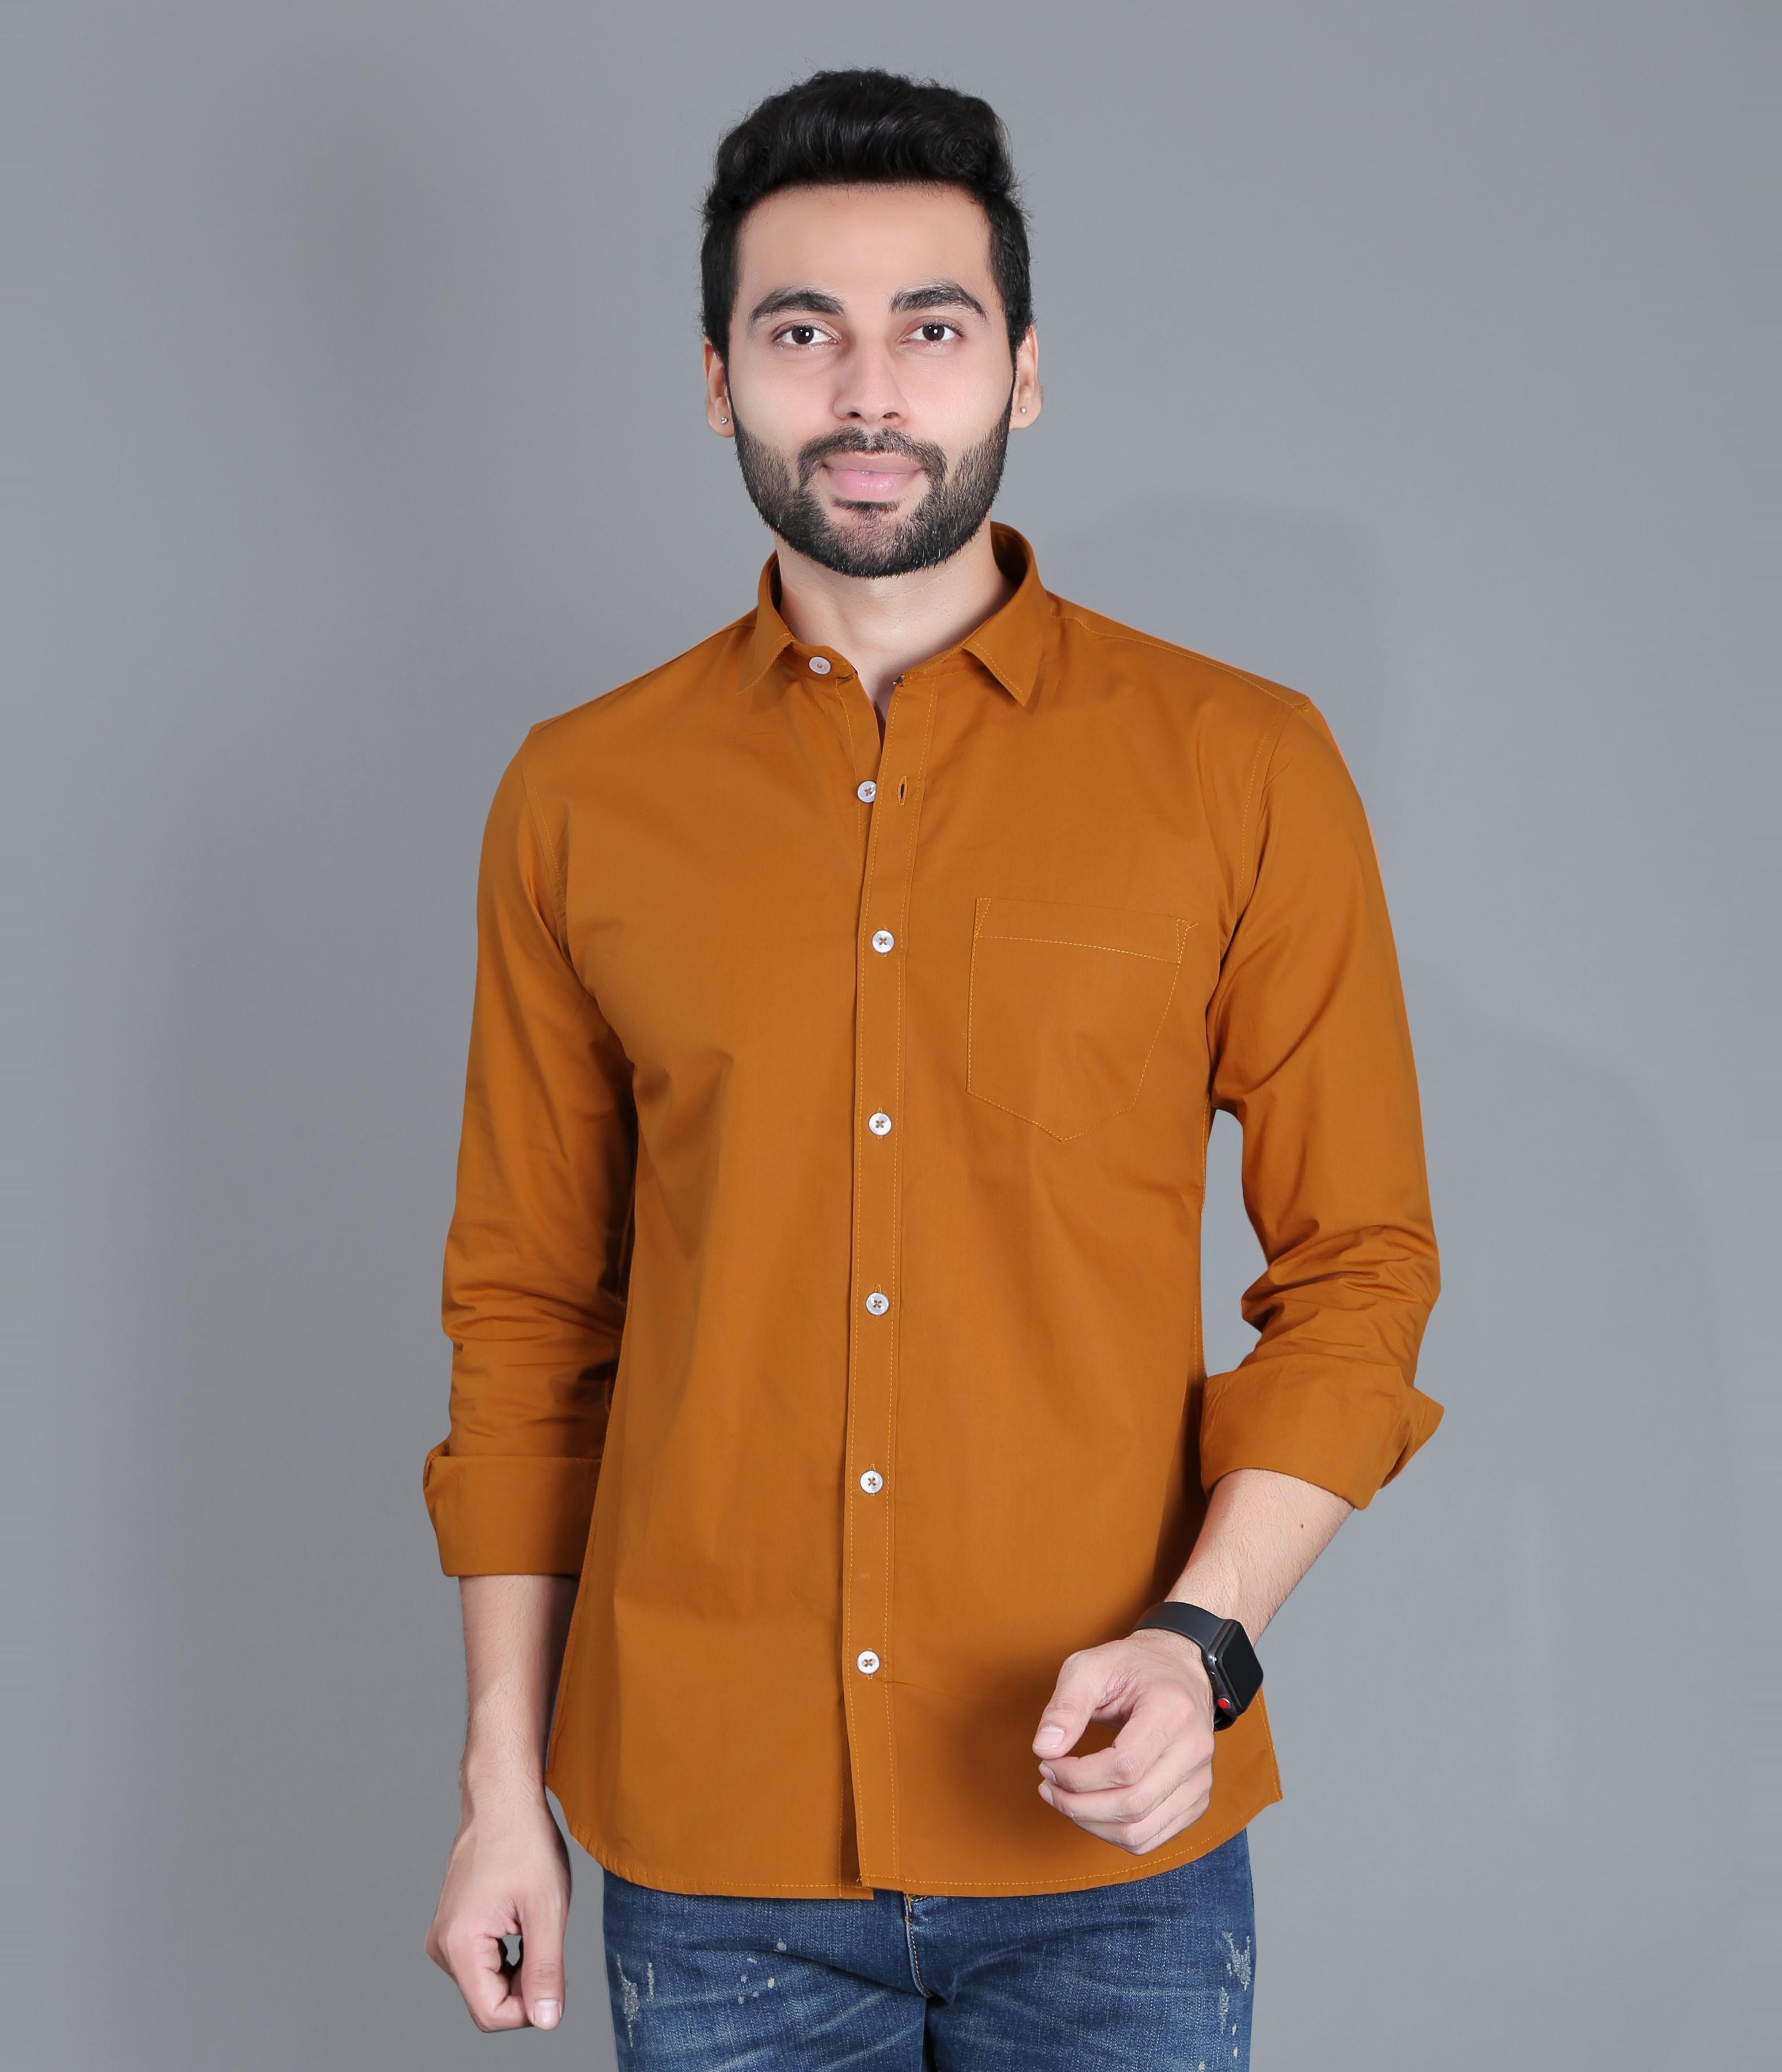 FIFTH ANFOLD Mens Copper Brown Casual Slim Collar Full/Long Sleev Slim Fit Shirt